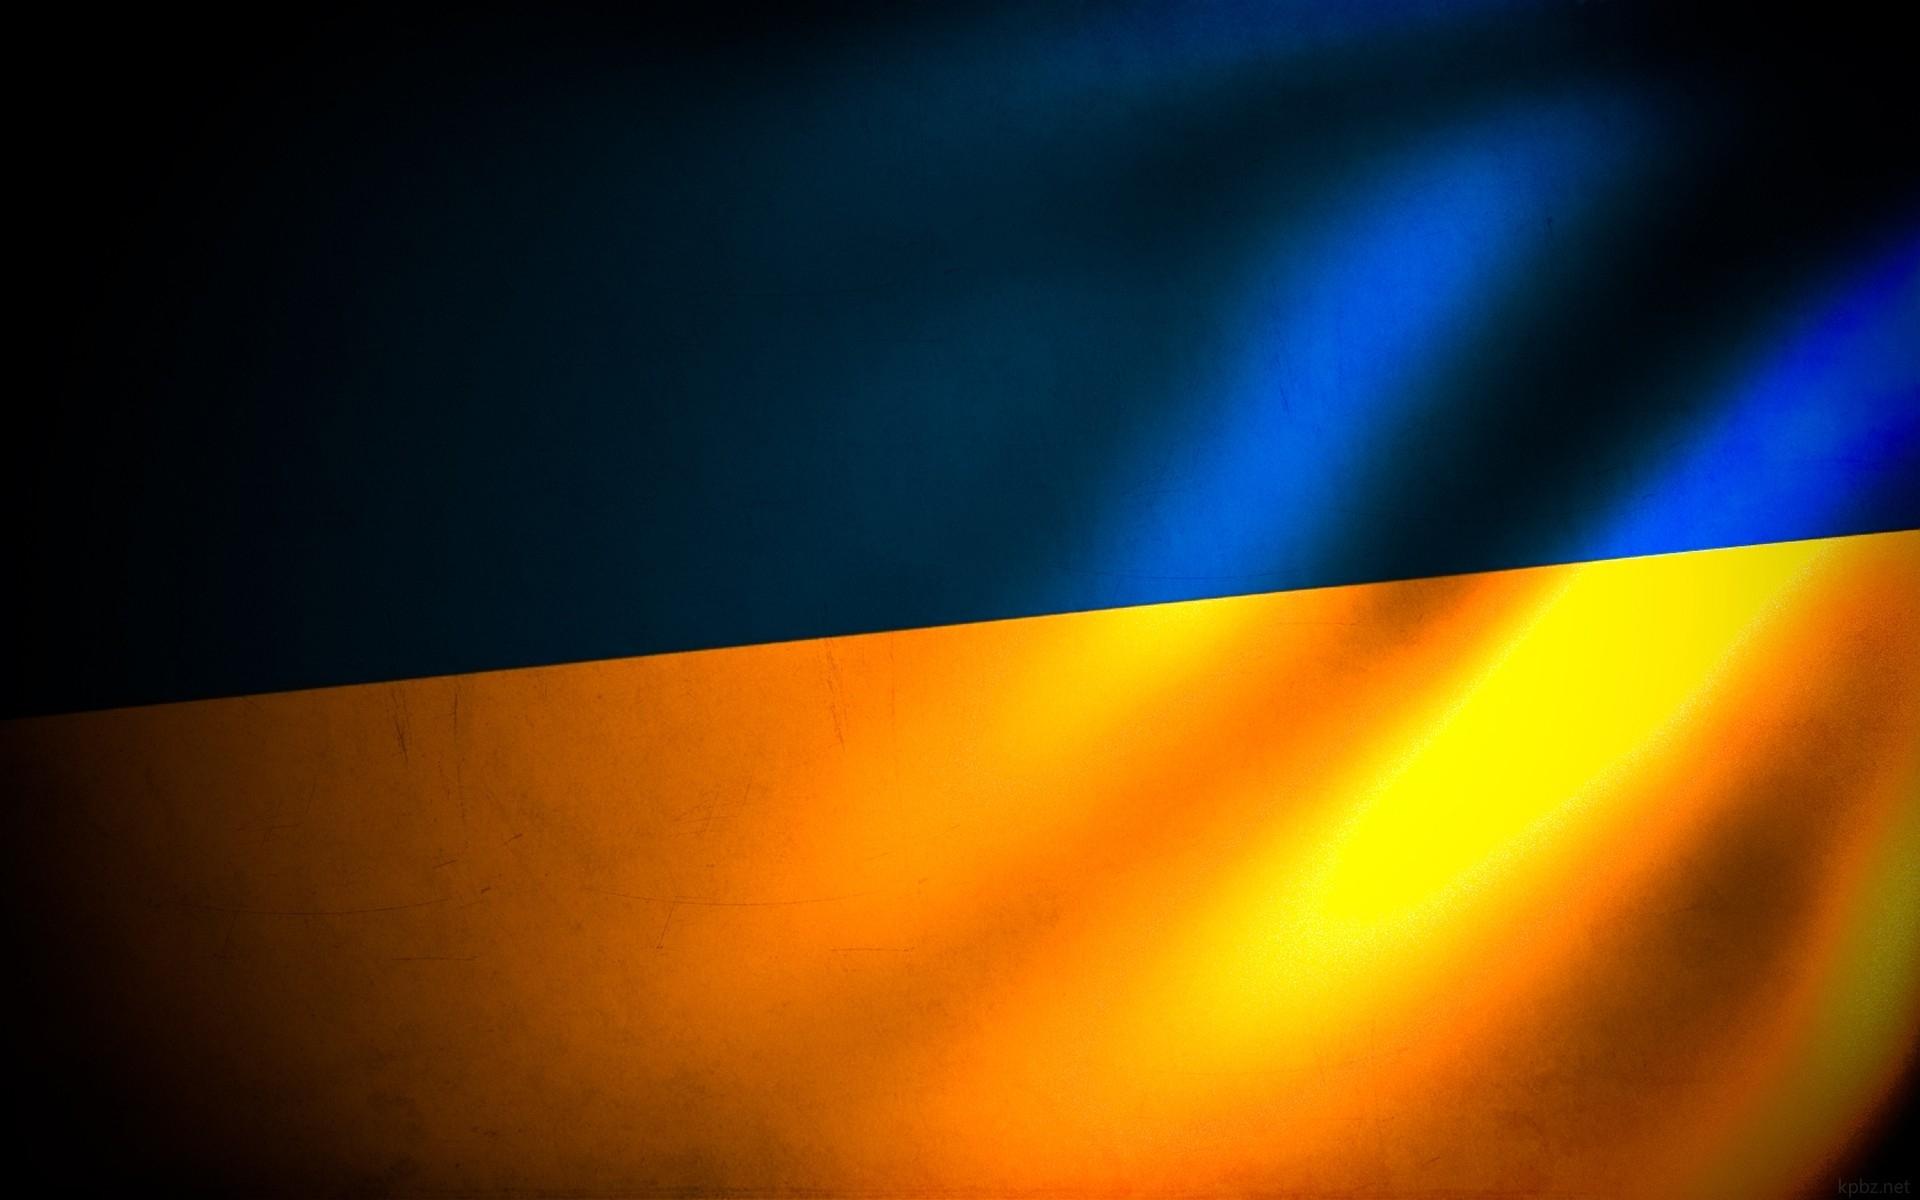 25104 Заставки и Обои Флаги на телефон. Скачать Флаги, Фон картинки бесплатно